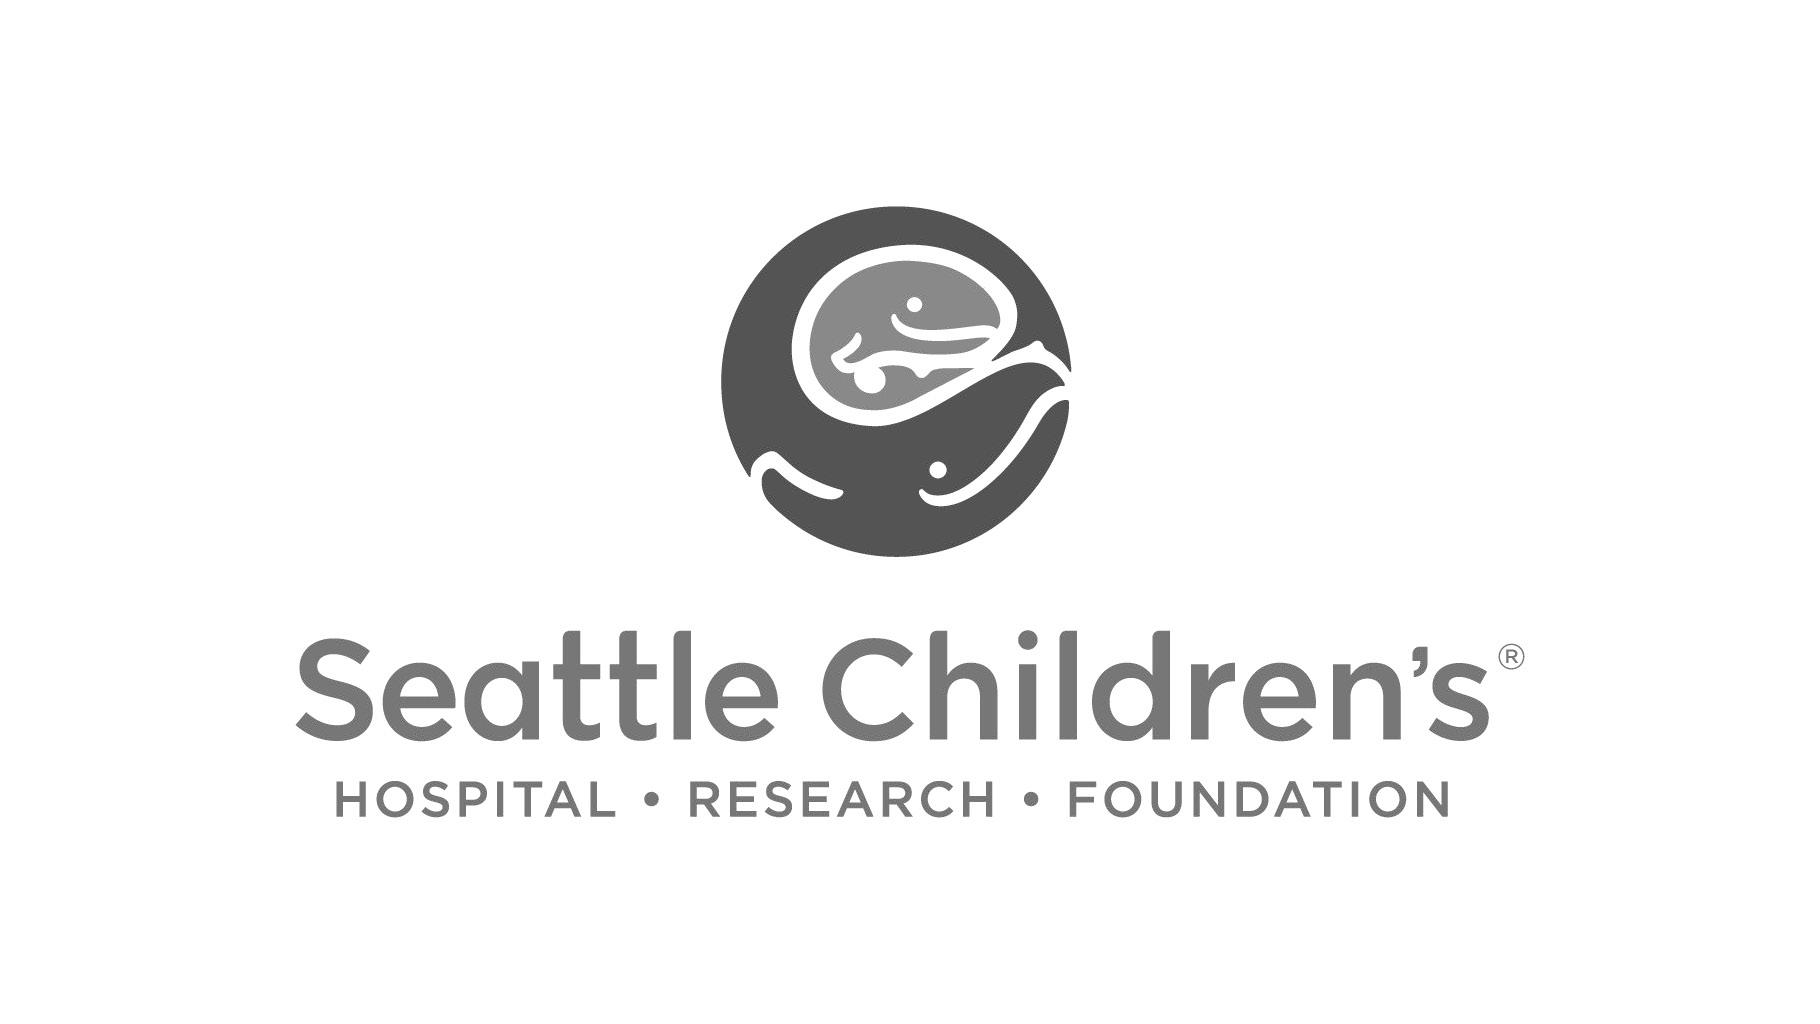 Seattle Children's - Hospital - Research - Foundation - logo